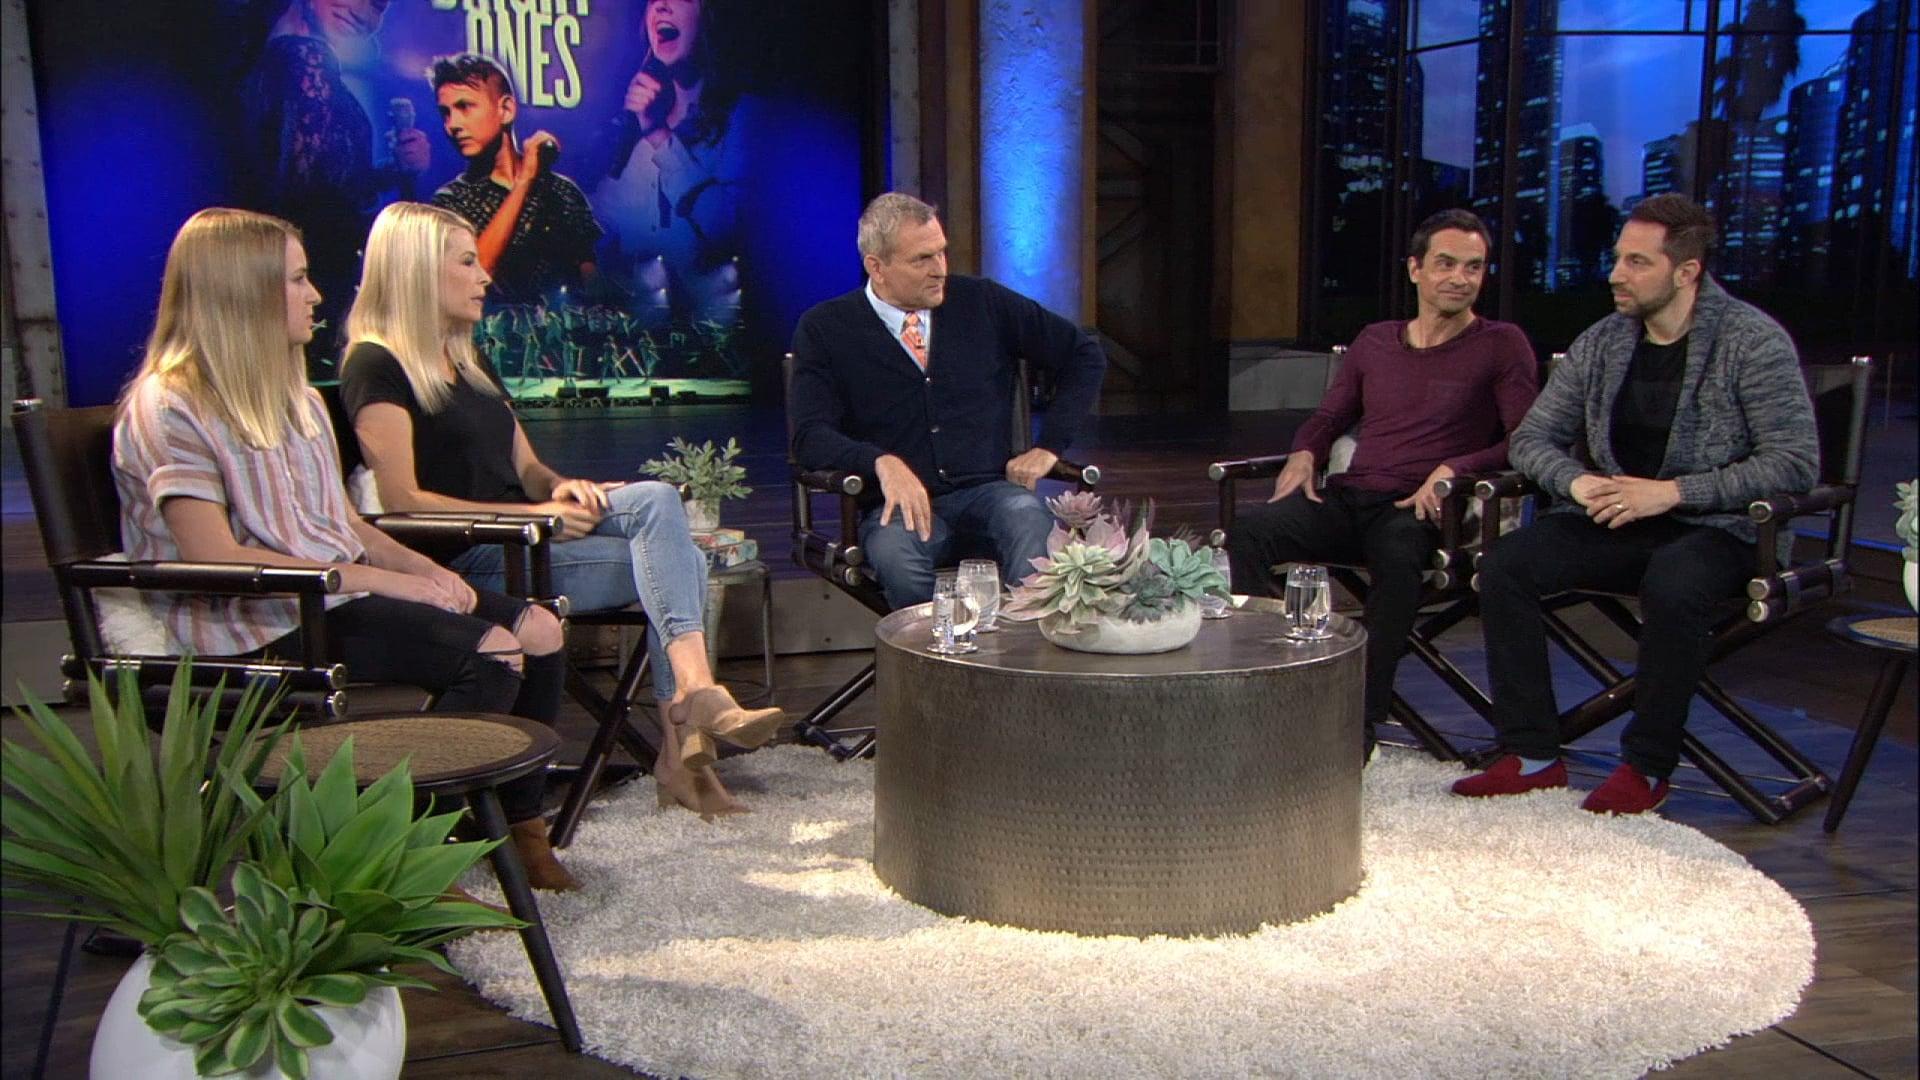 Tom Newman hosts David Narona, Fred Vassallo, Tea and Jenn Johnson.